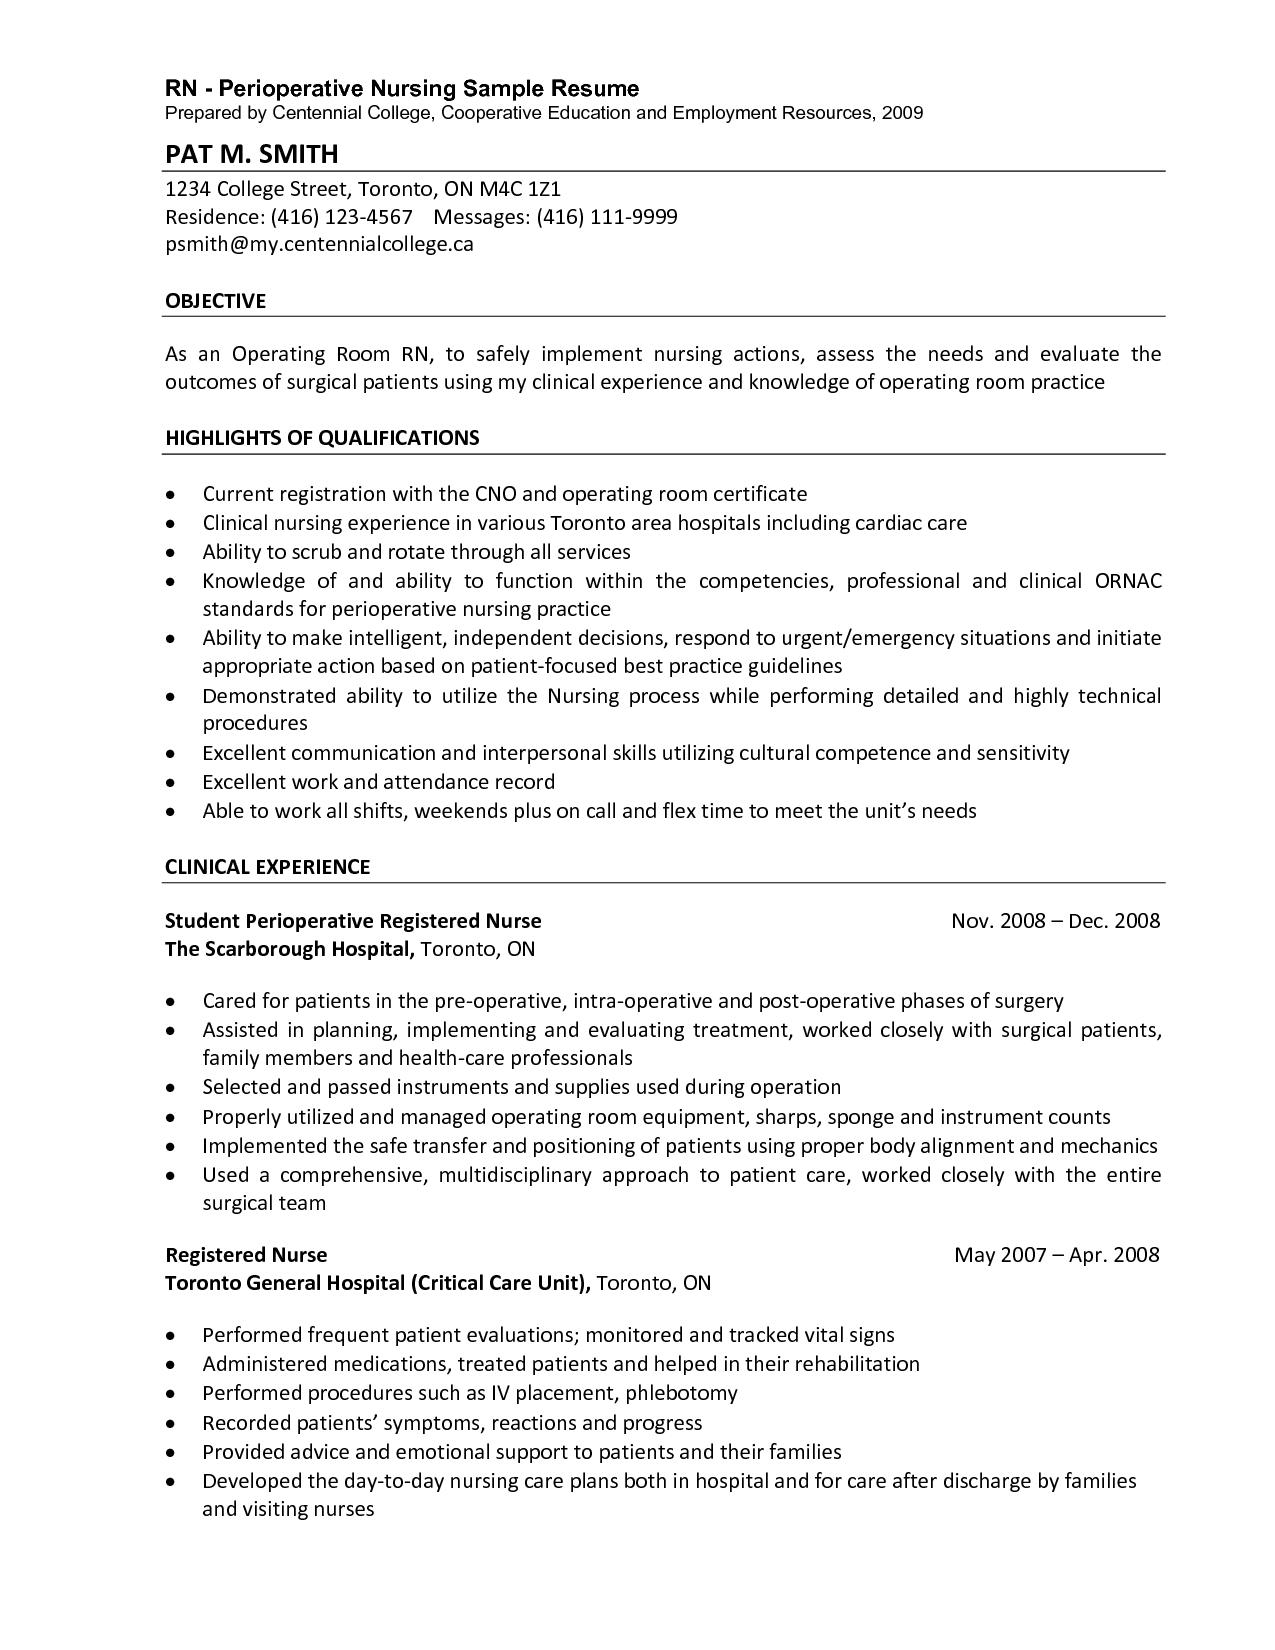 Perioperative Nurse Resume Http Www Resumecareer Info Perioperative Nurse Resume